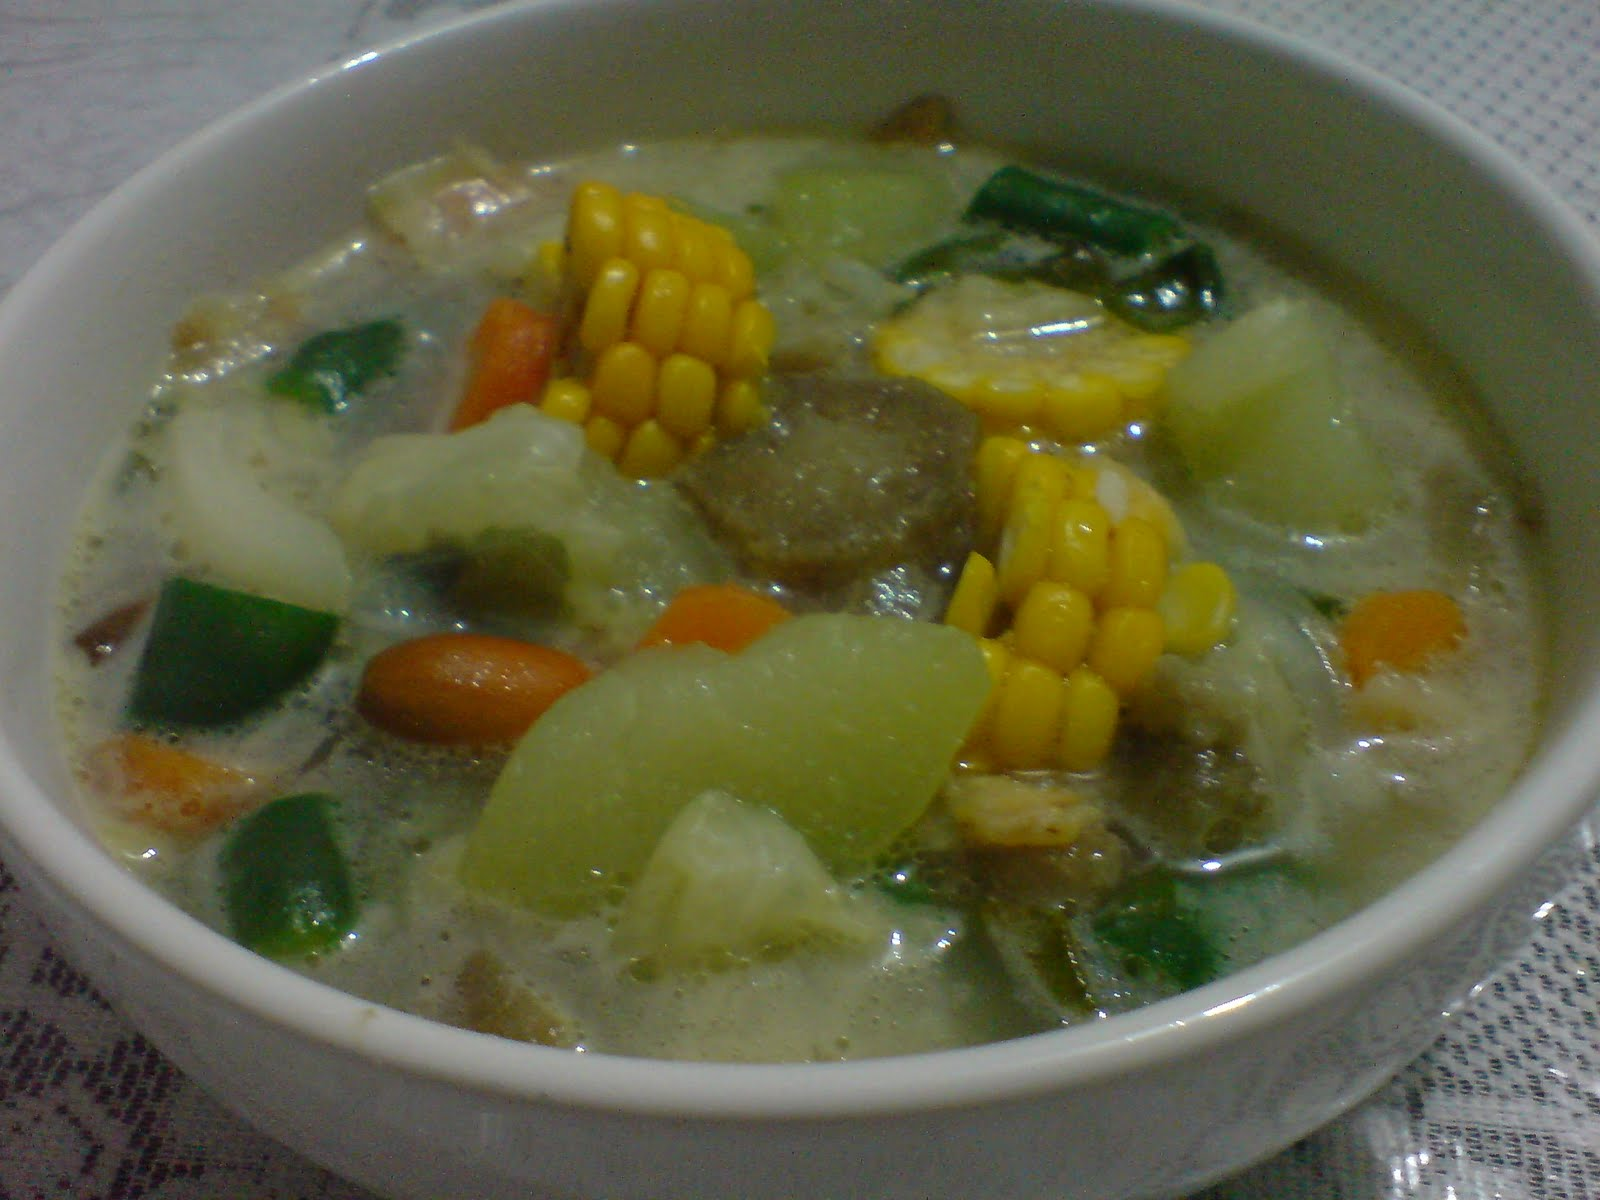 resep makanan enak resep sayur lodeh enak